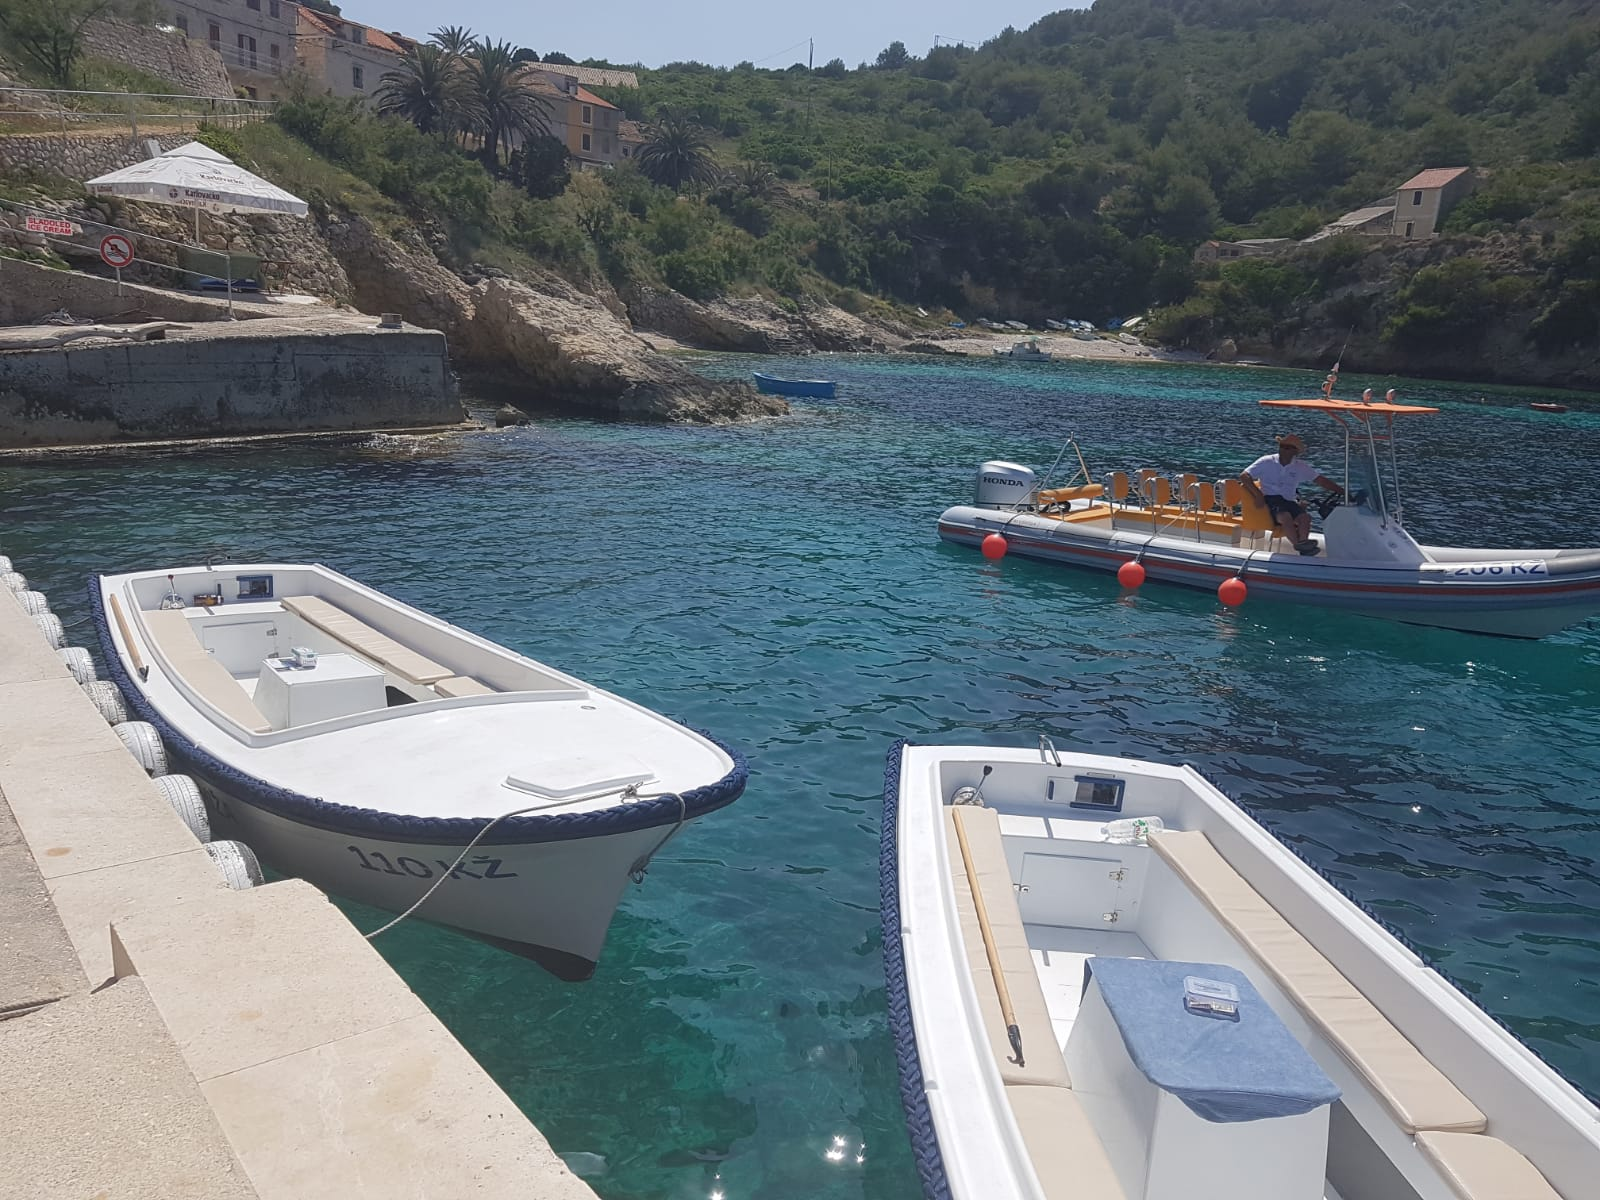 Tours in Split Croatia 2019 - Blue Cave